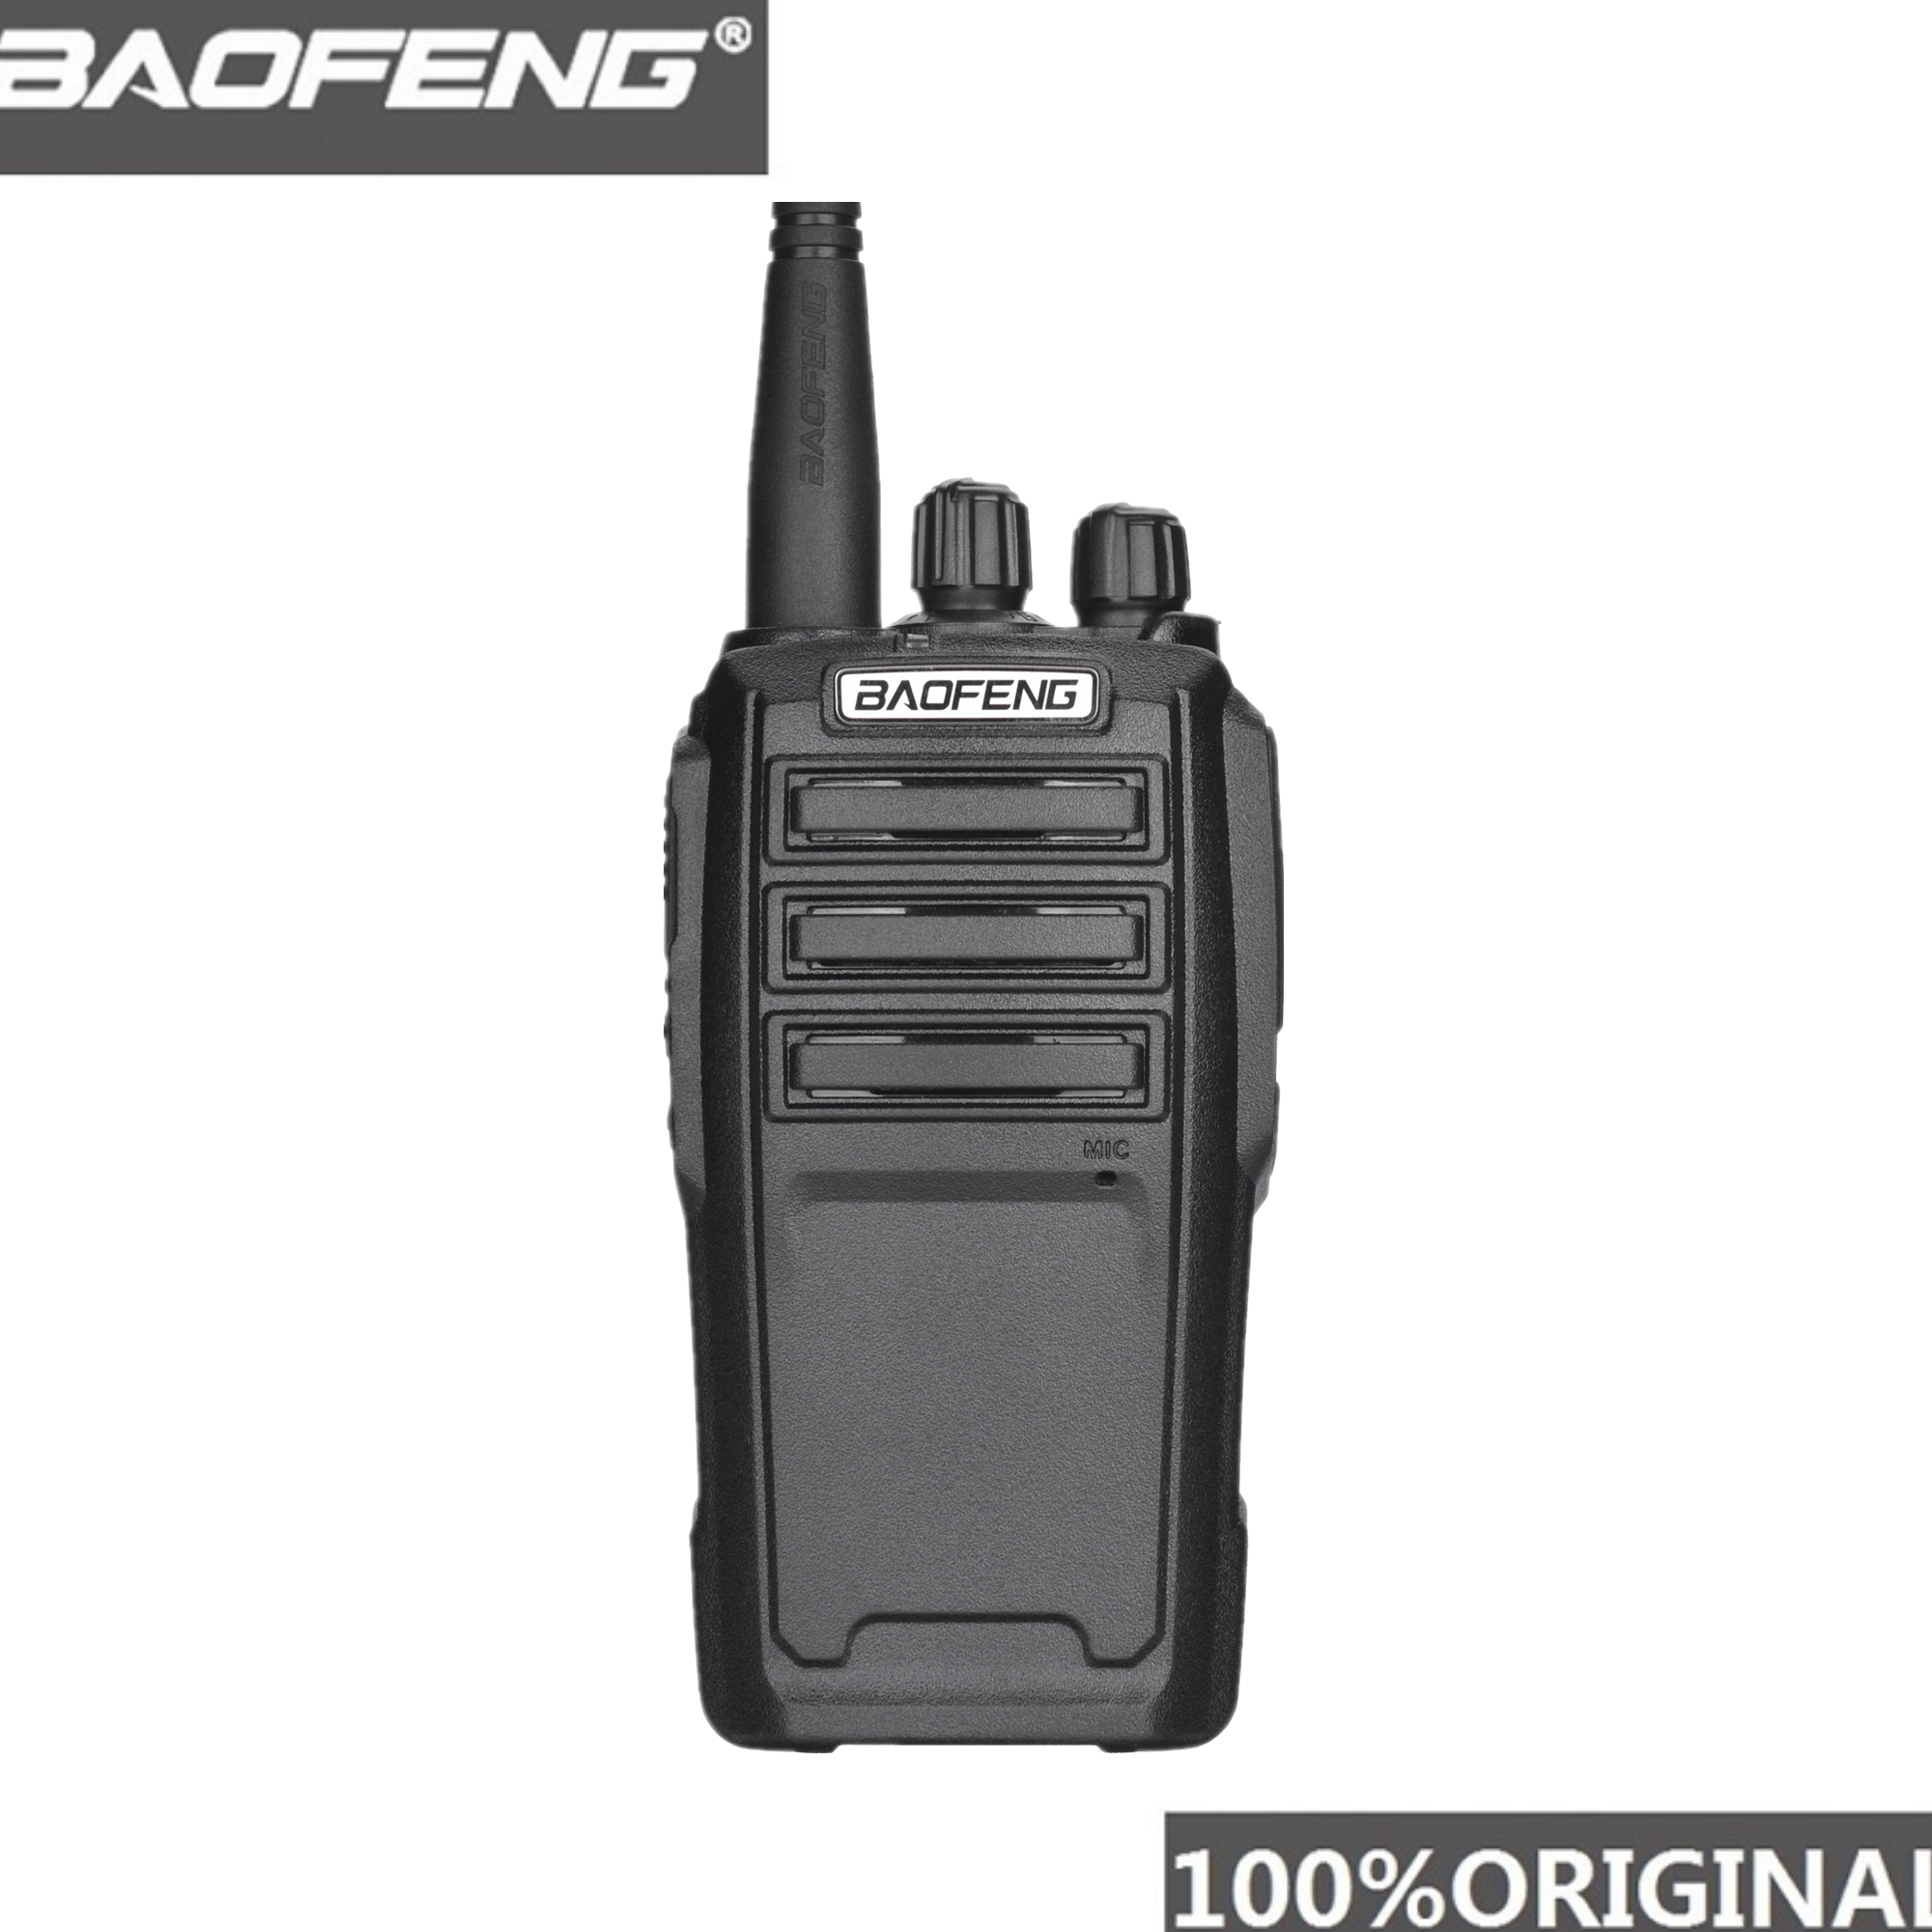 Baofeng UV-6 Walkie Talkie Long Range Two Way Radio 136-174/400-480MHz VHF UHF Dual Band Handheld Radio Transceiver Interphone